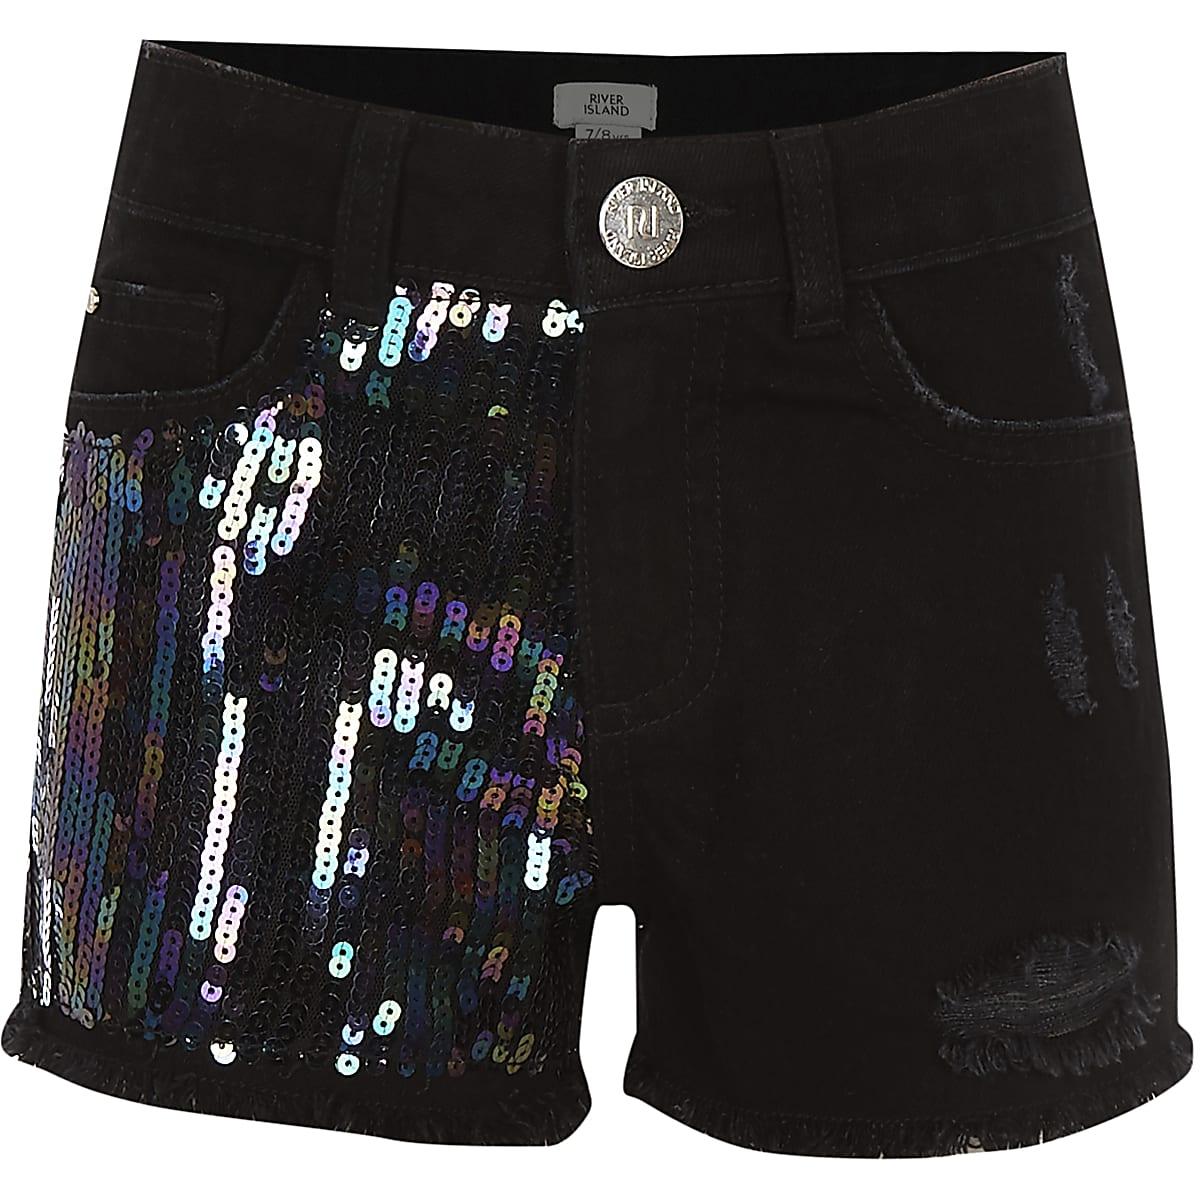 Girls black Becca sequin shorts